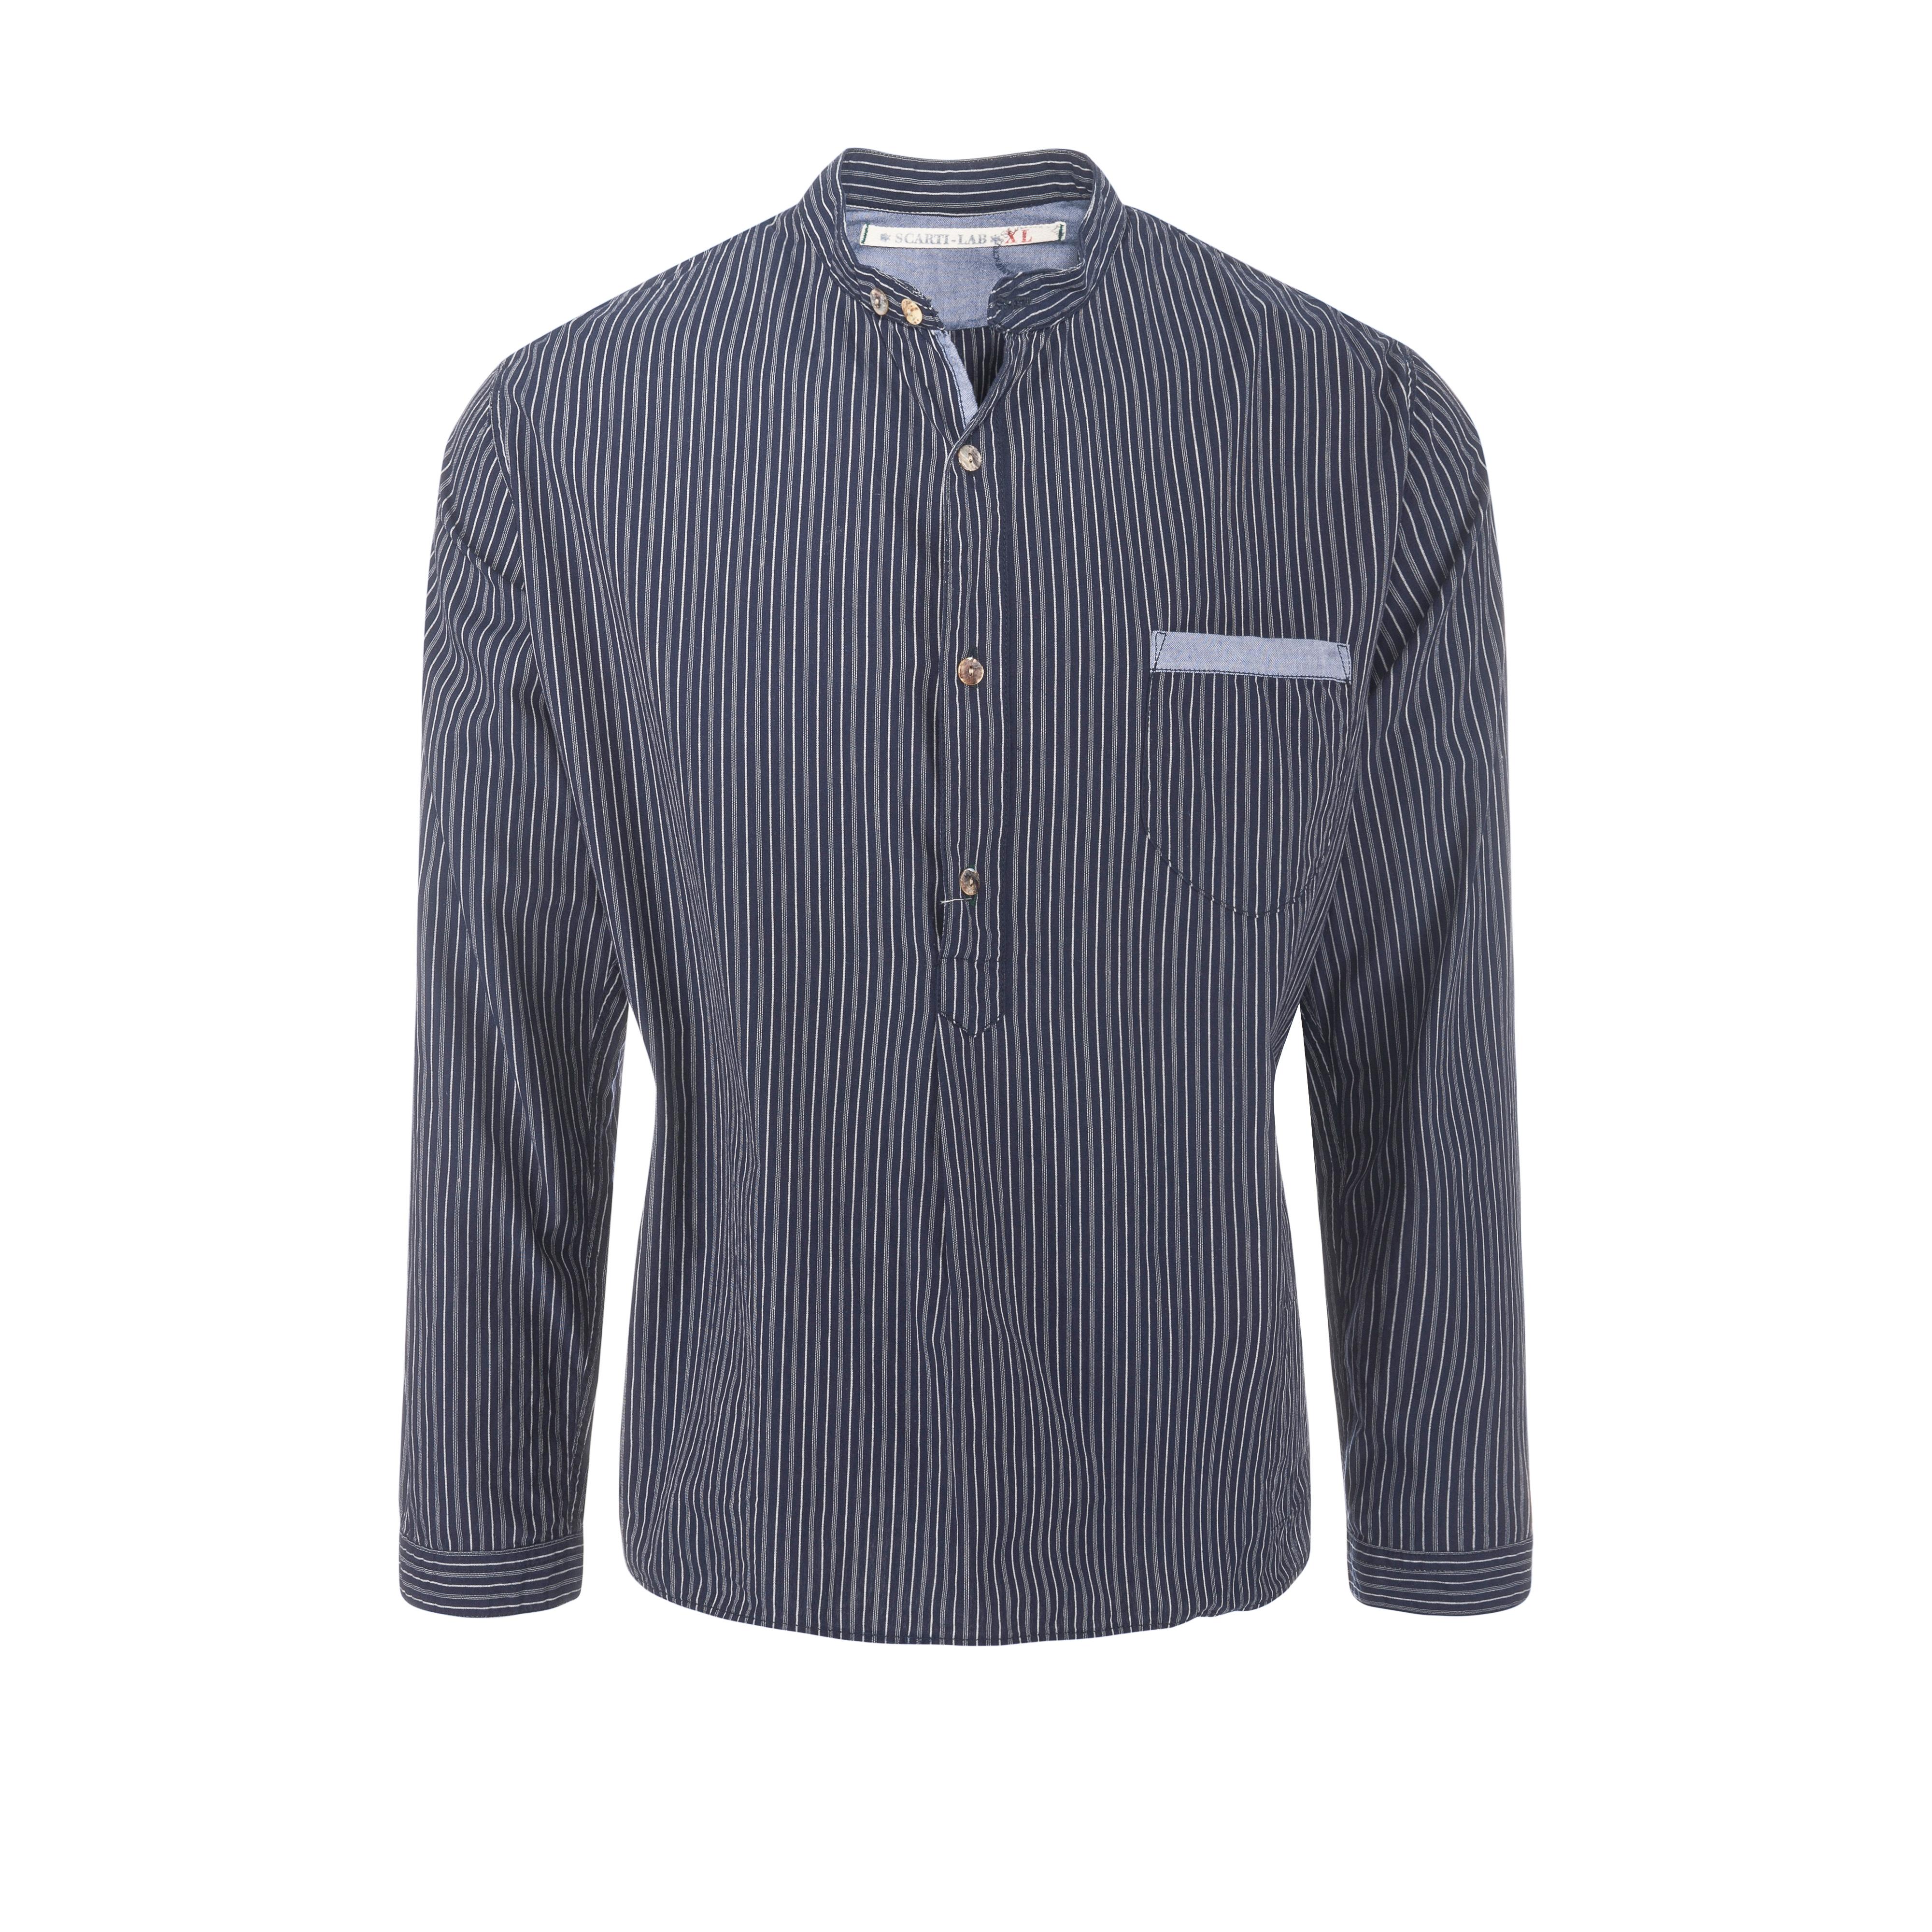 Cotton Shirt Stripe Navy/White